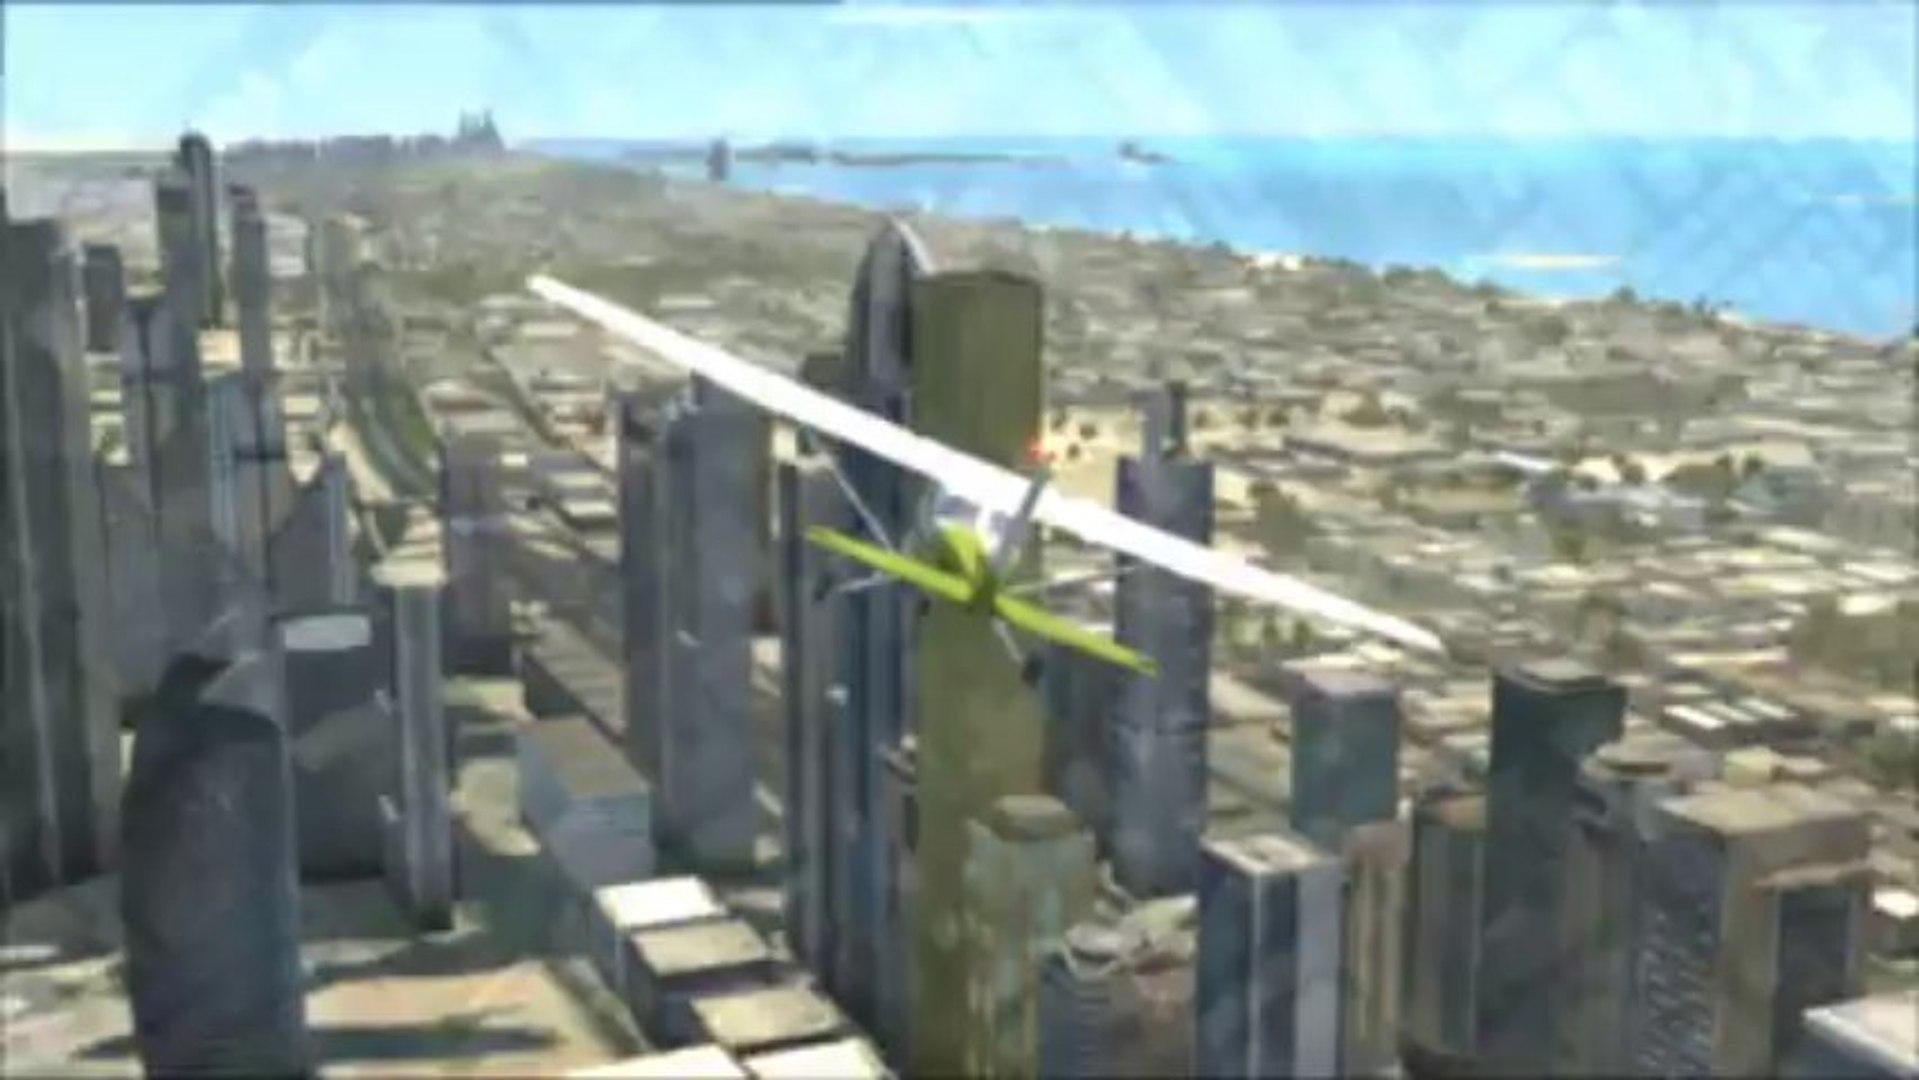 [HD] FSX✈Scenery FlyTampa Dubai Reboot V2 0+V2 1 Update Download HD